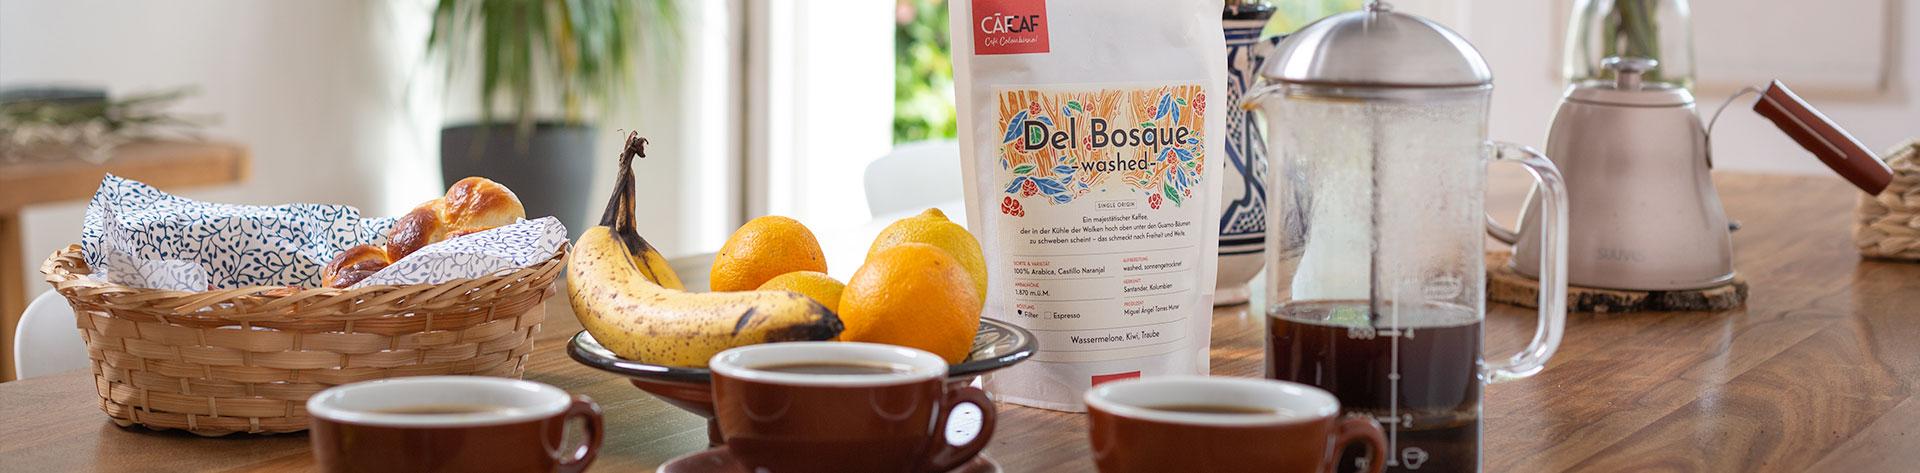 CafCaf Kaffeeshop: Frischer Kaffee aus Kolumbien kaufen